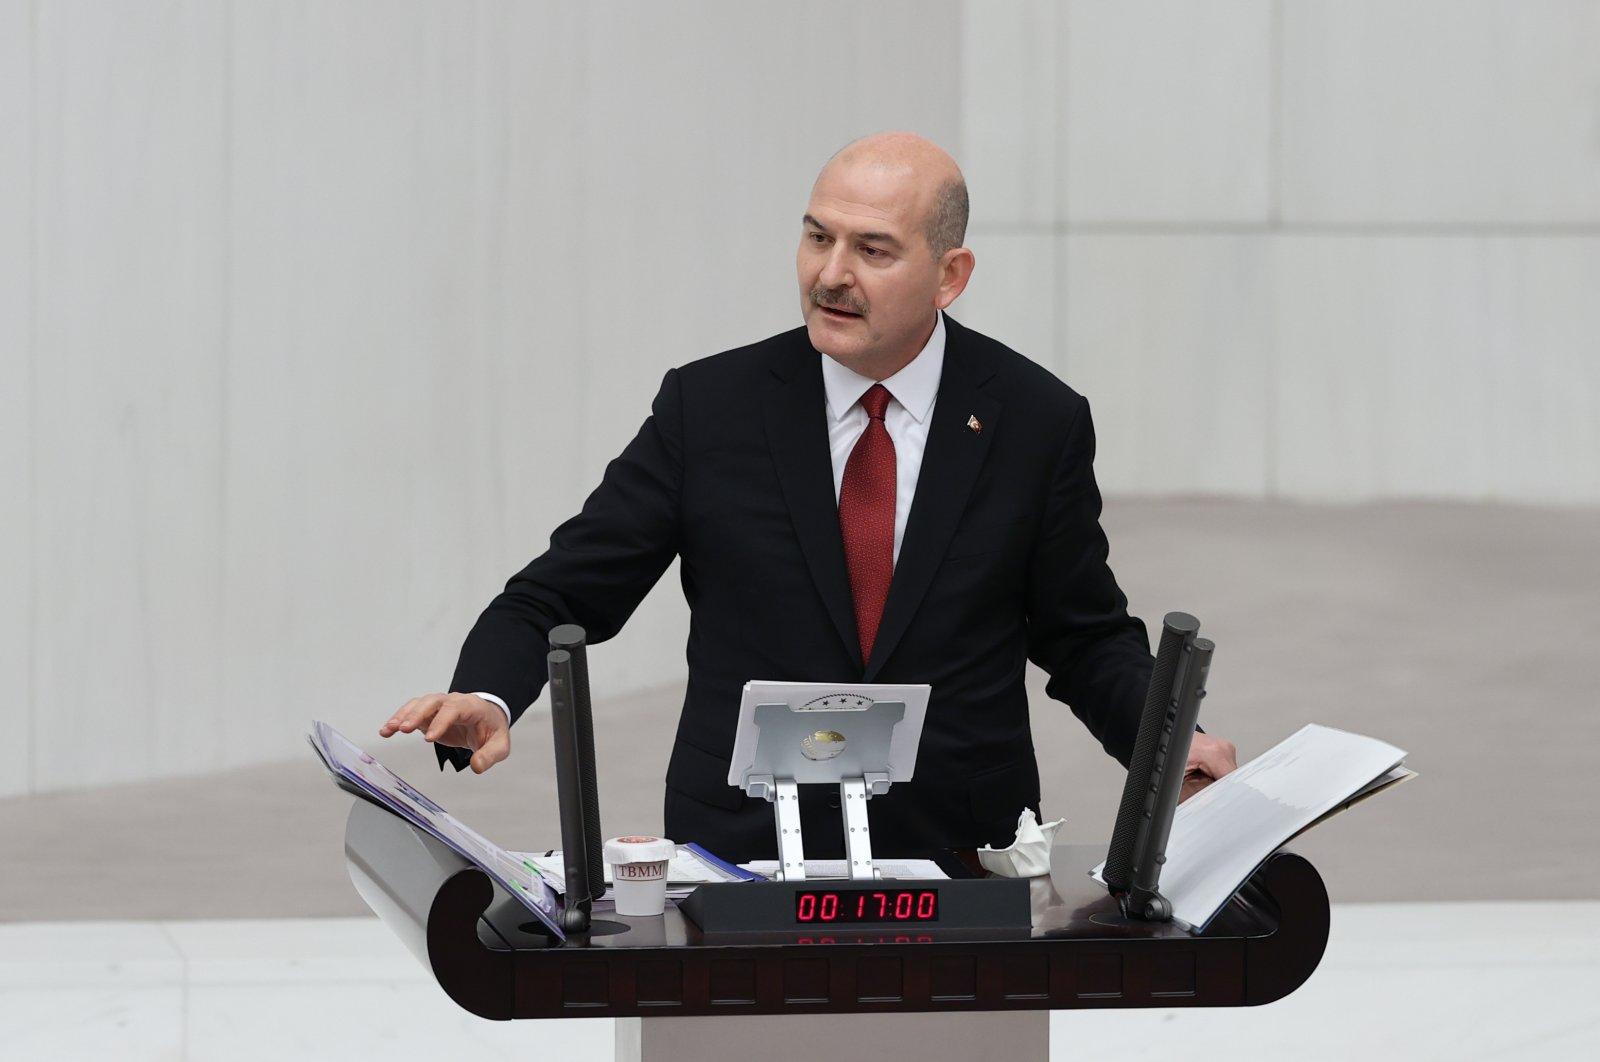 Interior Minister Süleyman Soylu gives a speech at the Turkish Parliament on Dec. 12, 2020 (AA Photo)